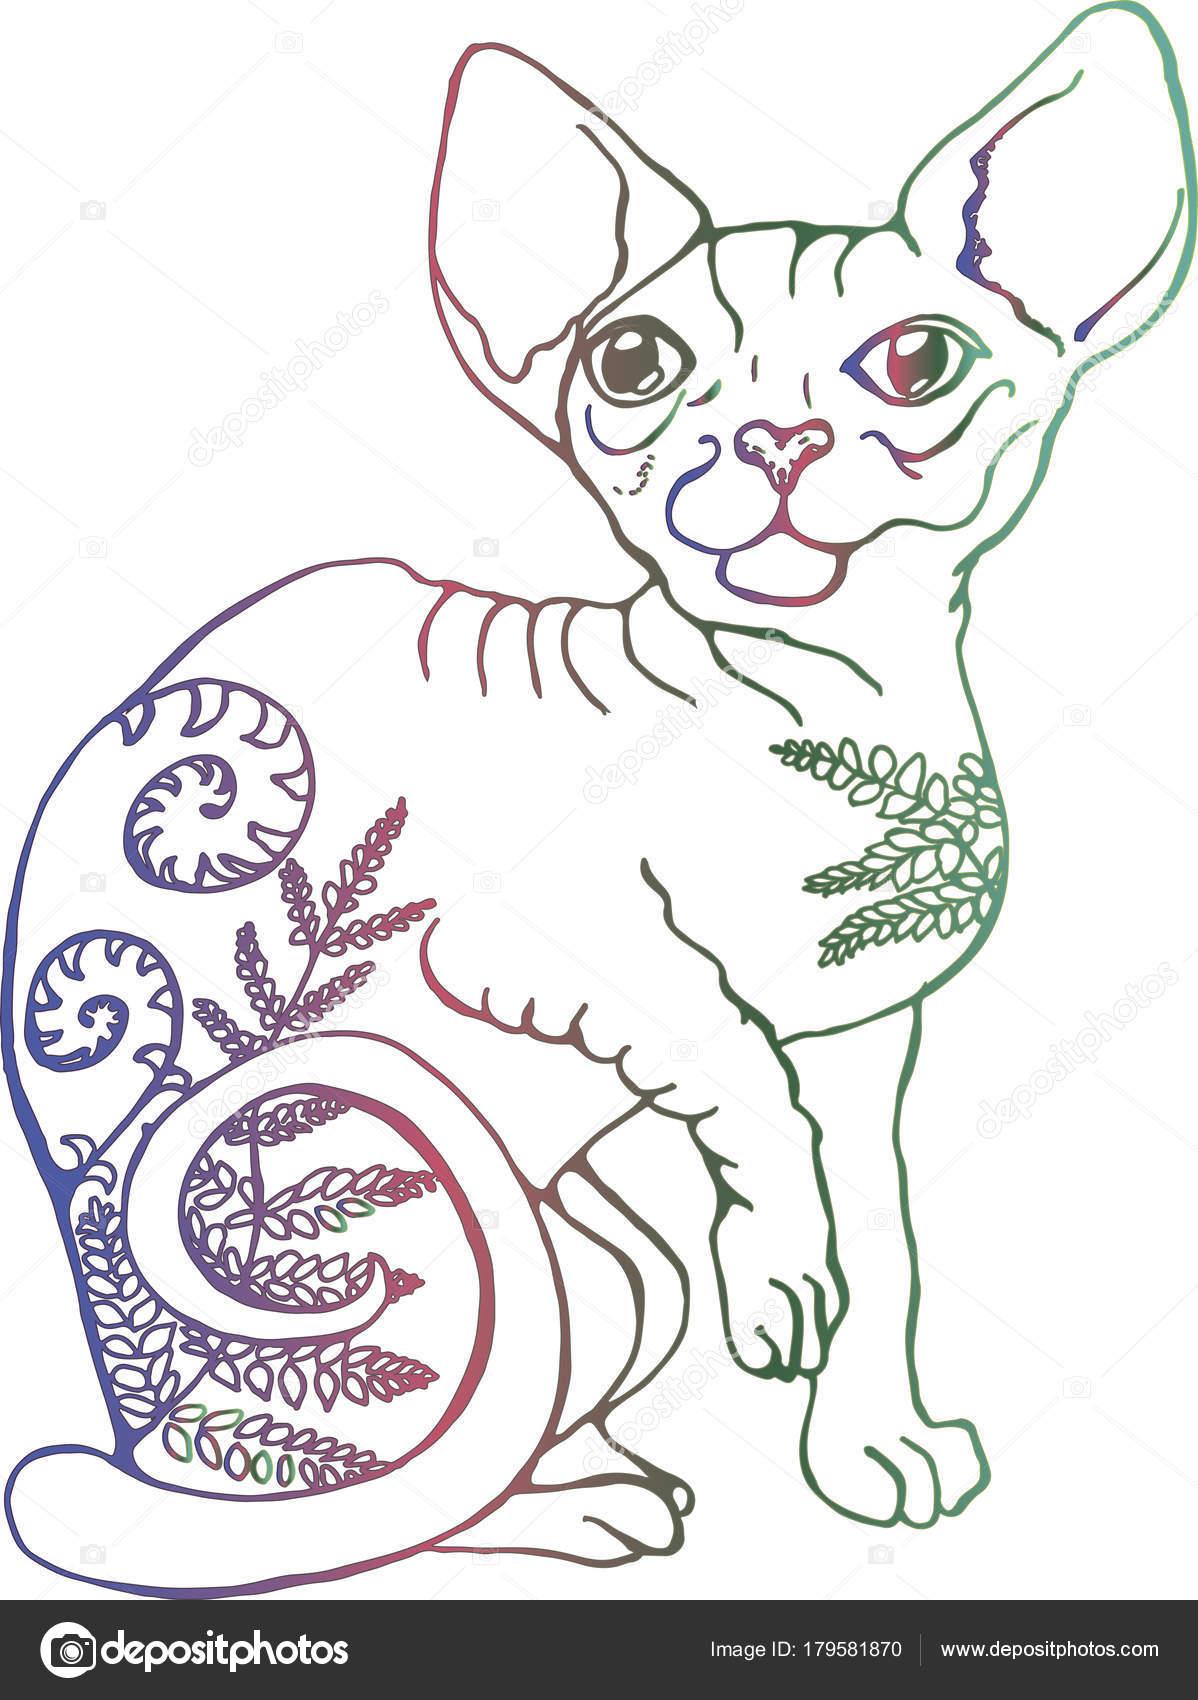 Ilustración de vector de un gato. Colorido retrato de un gato ...